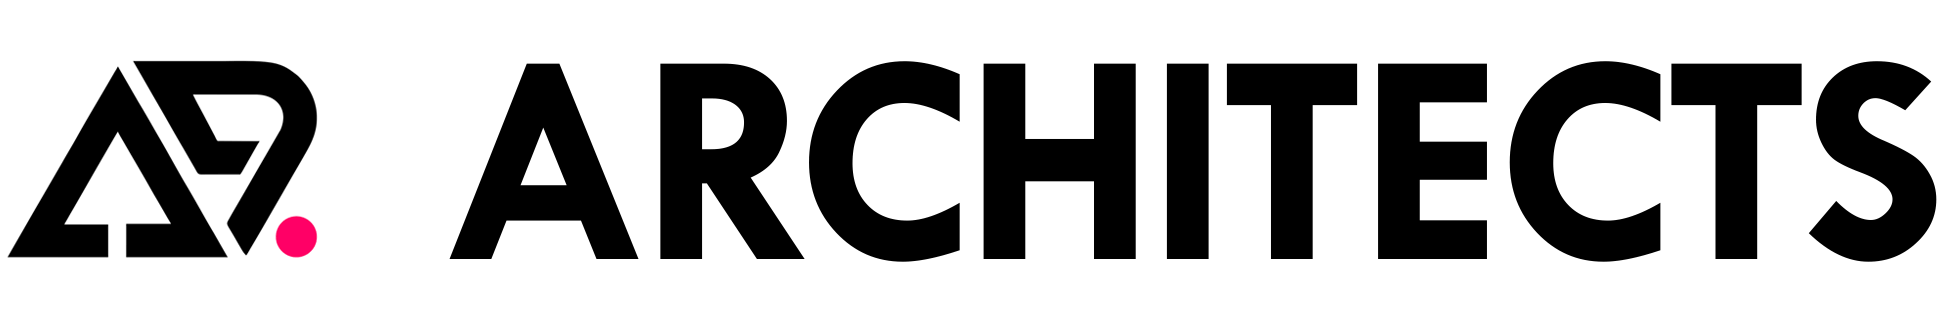 A9-Architects-logo